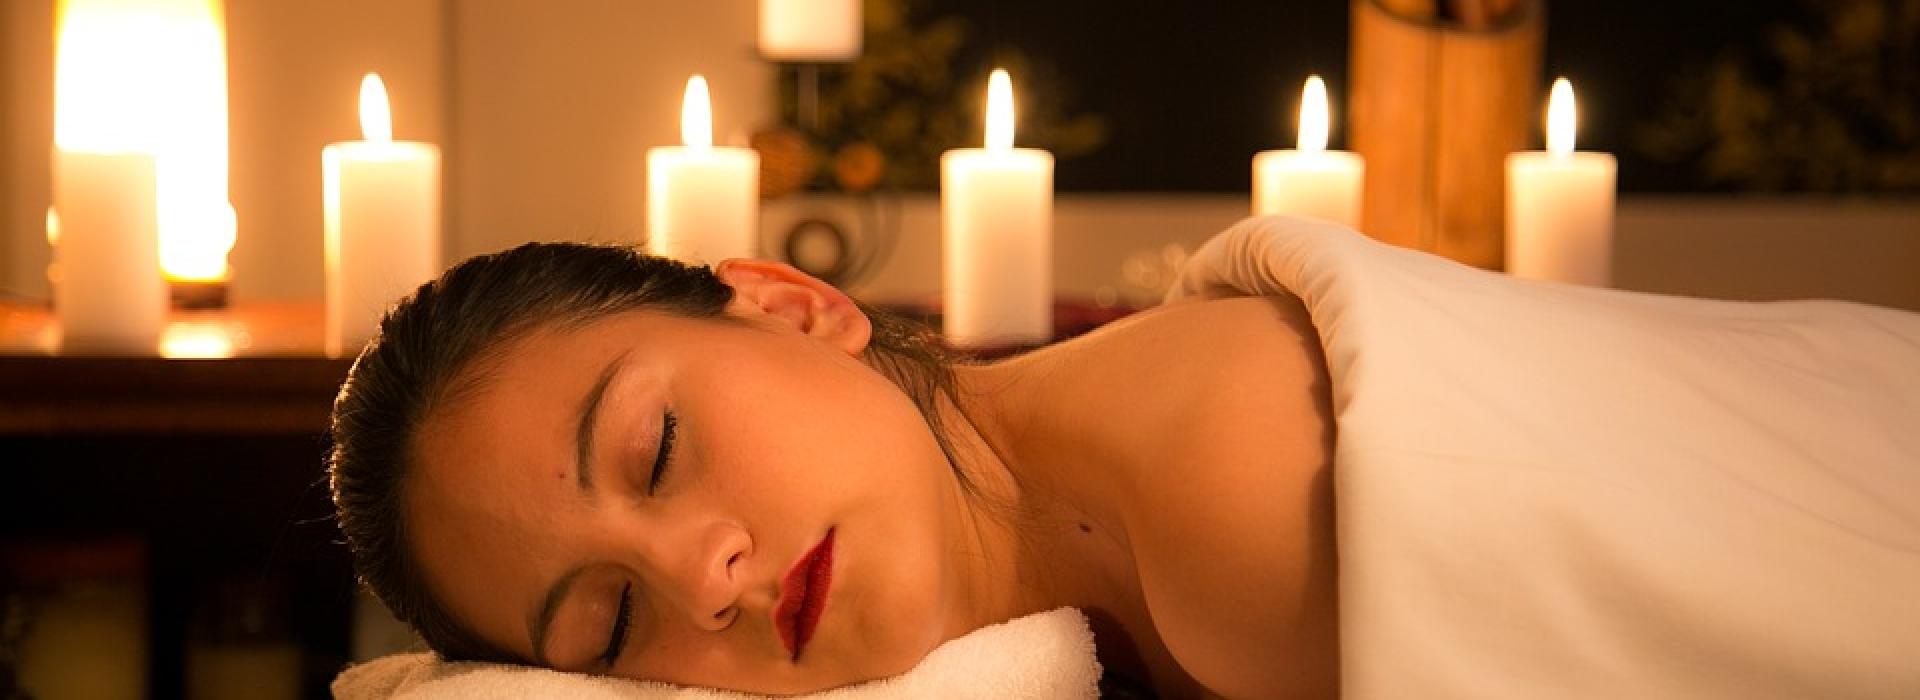 The Aura Tree Skin Clinic  and Beauty treatments in Bury Lancashire